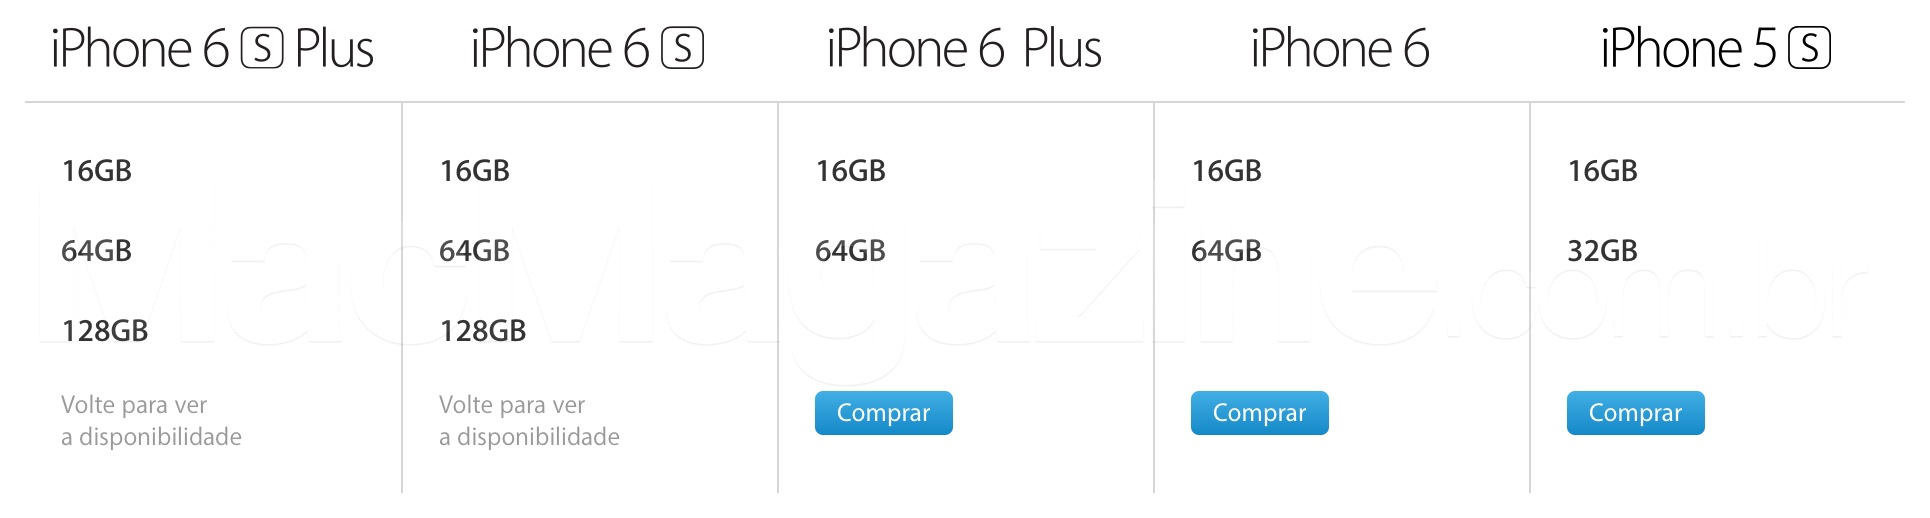 Capacidades dos iPhones